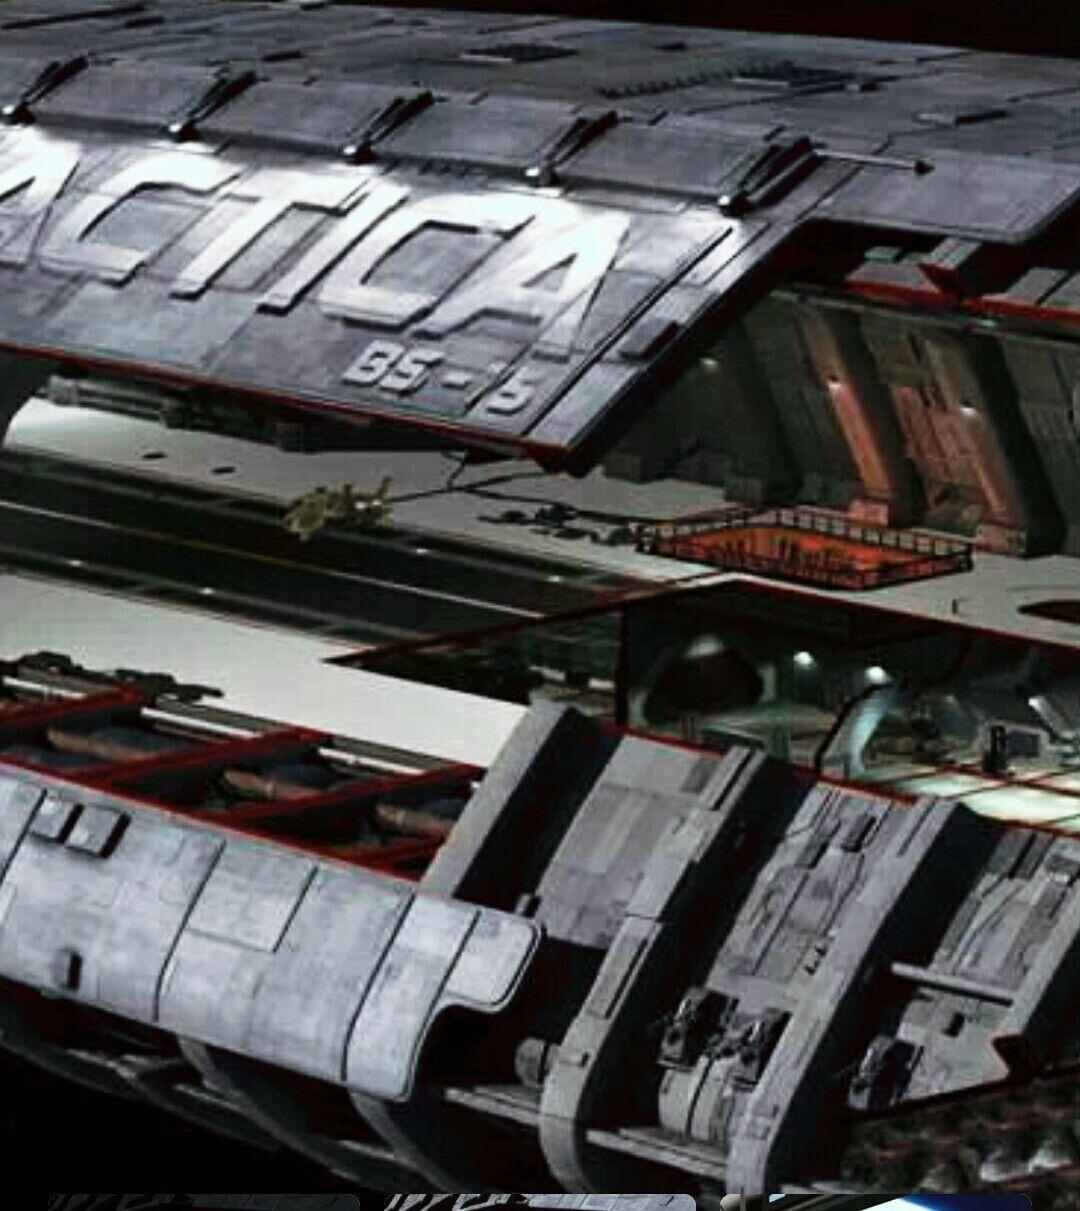 Pin by Daniel Patenaude on Bsg | Battlestar galactica ship ...  |Battlestar Galactica Spacecraft